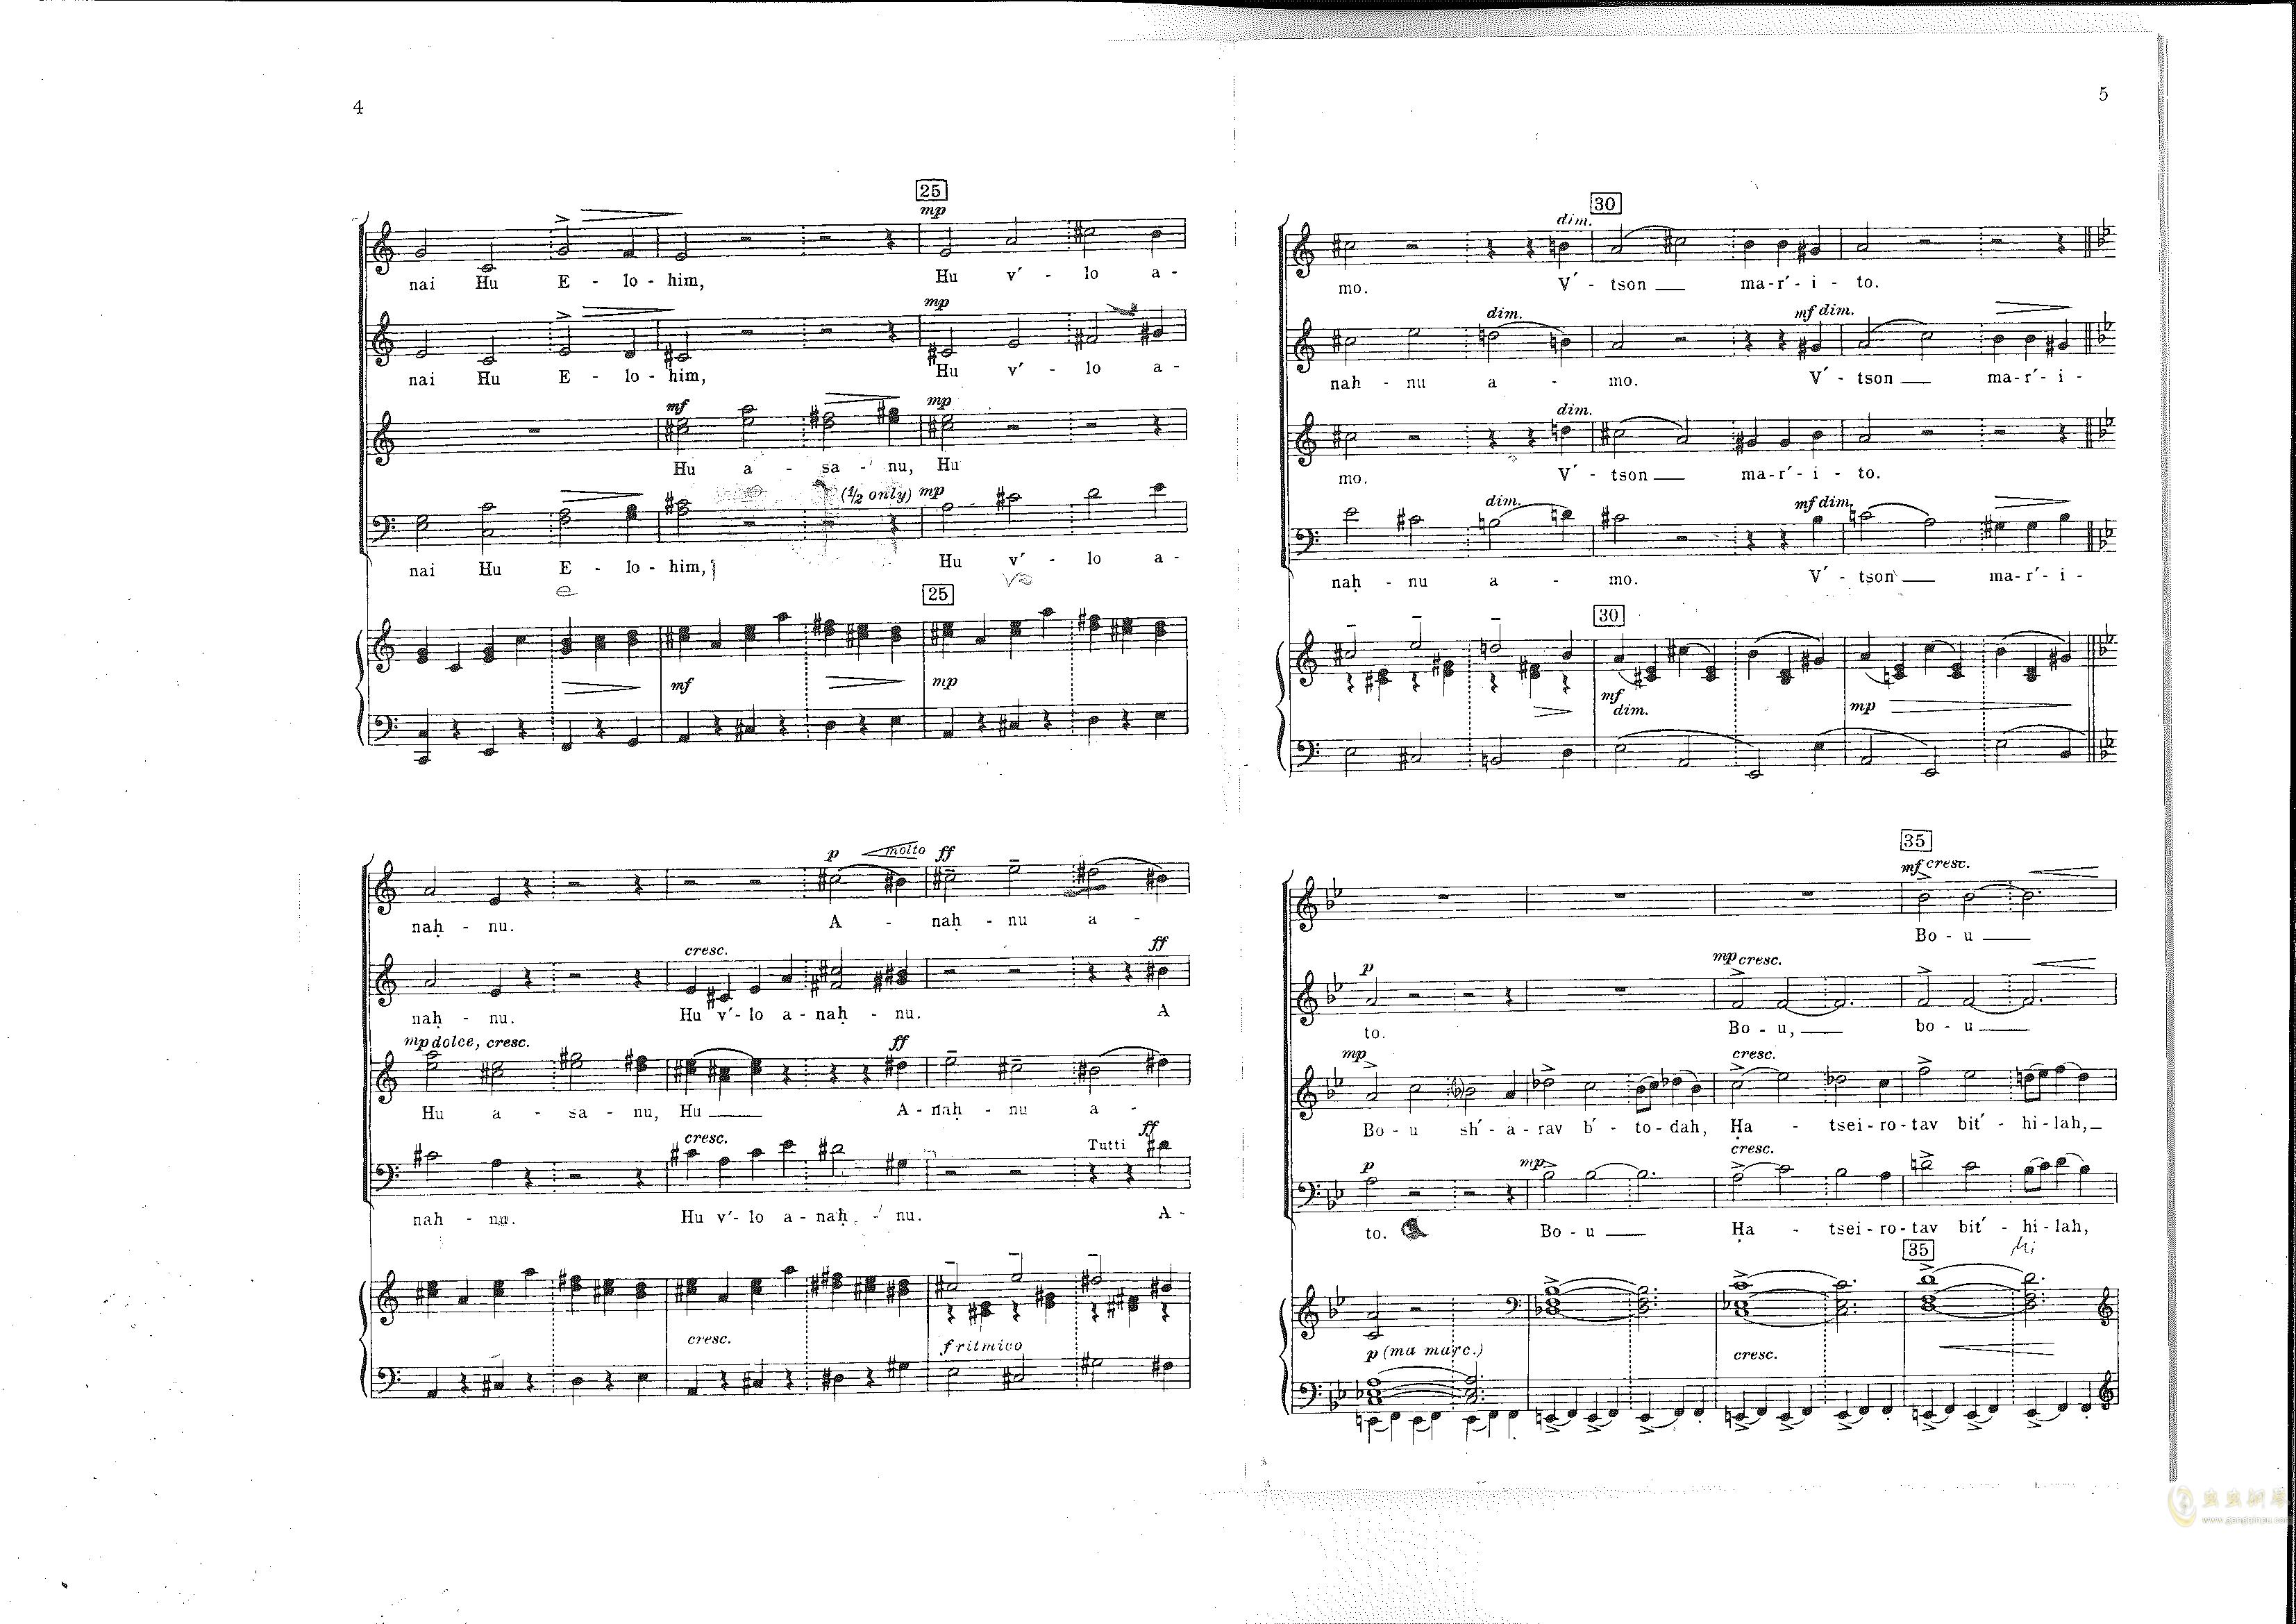 Chichester Psalms澳门星际官网 第6页